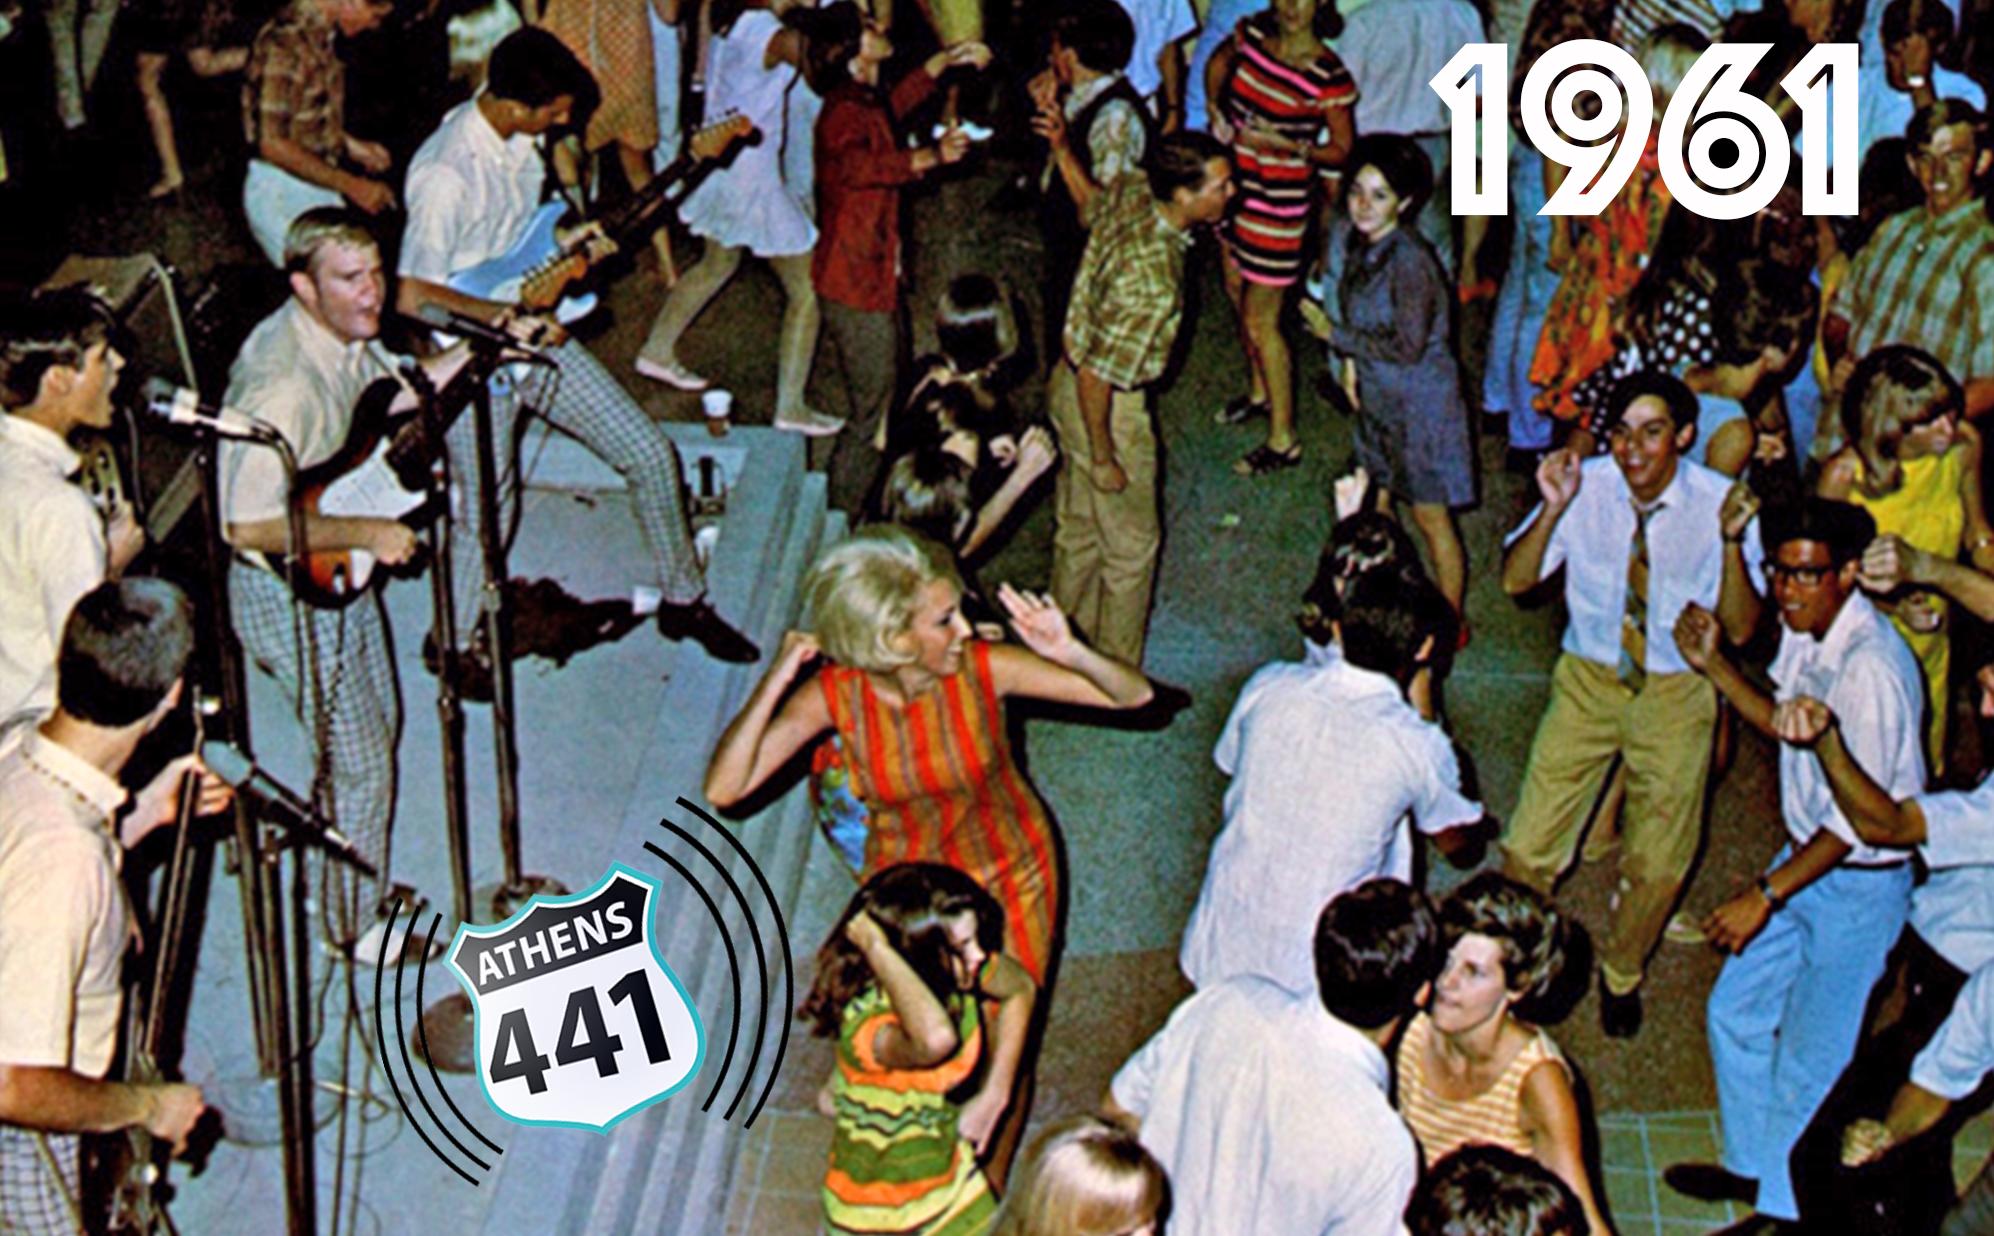 A441_1961.jpg